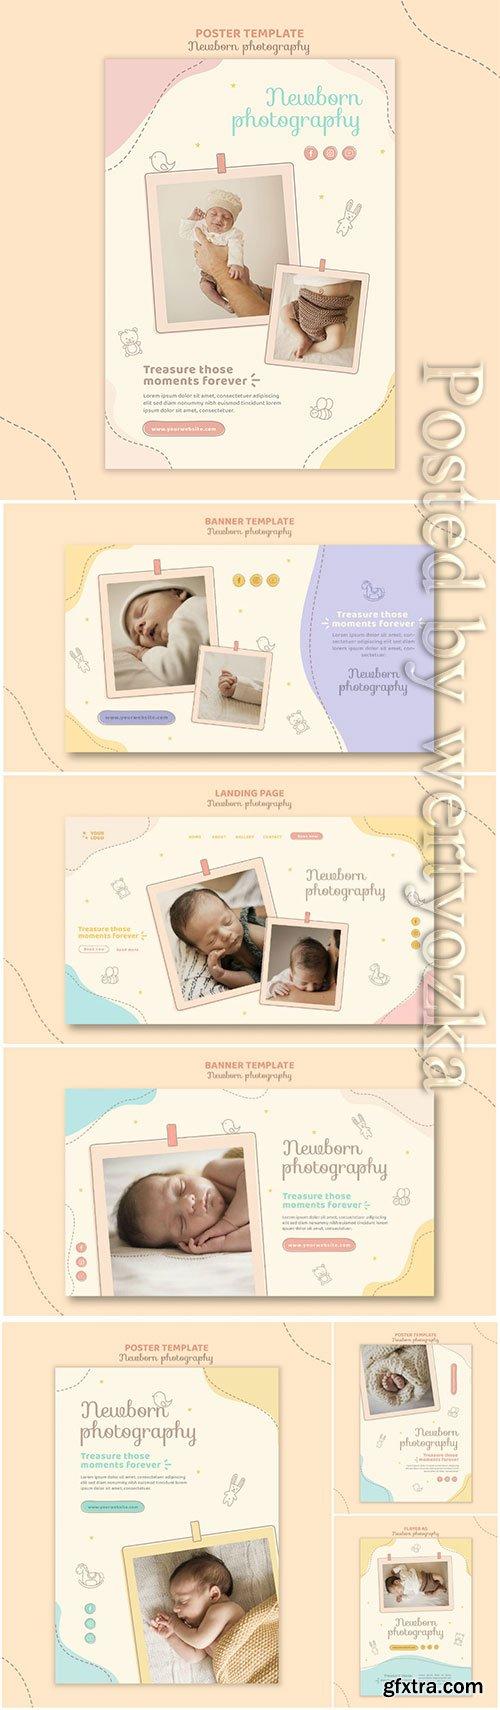 Cute sleeping baby banner template psd